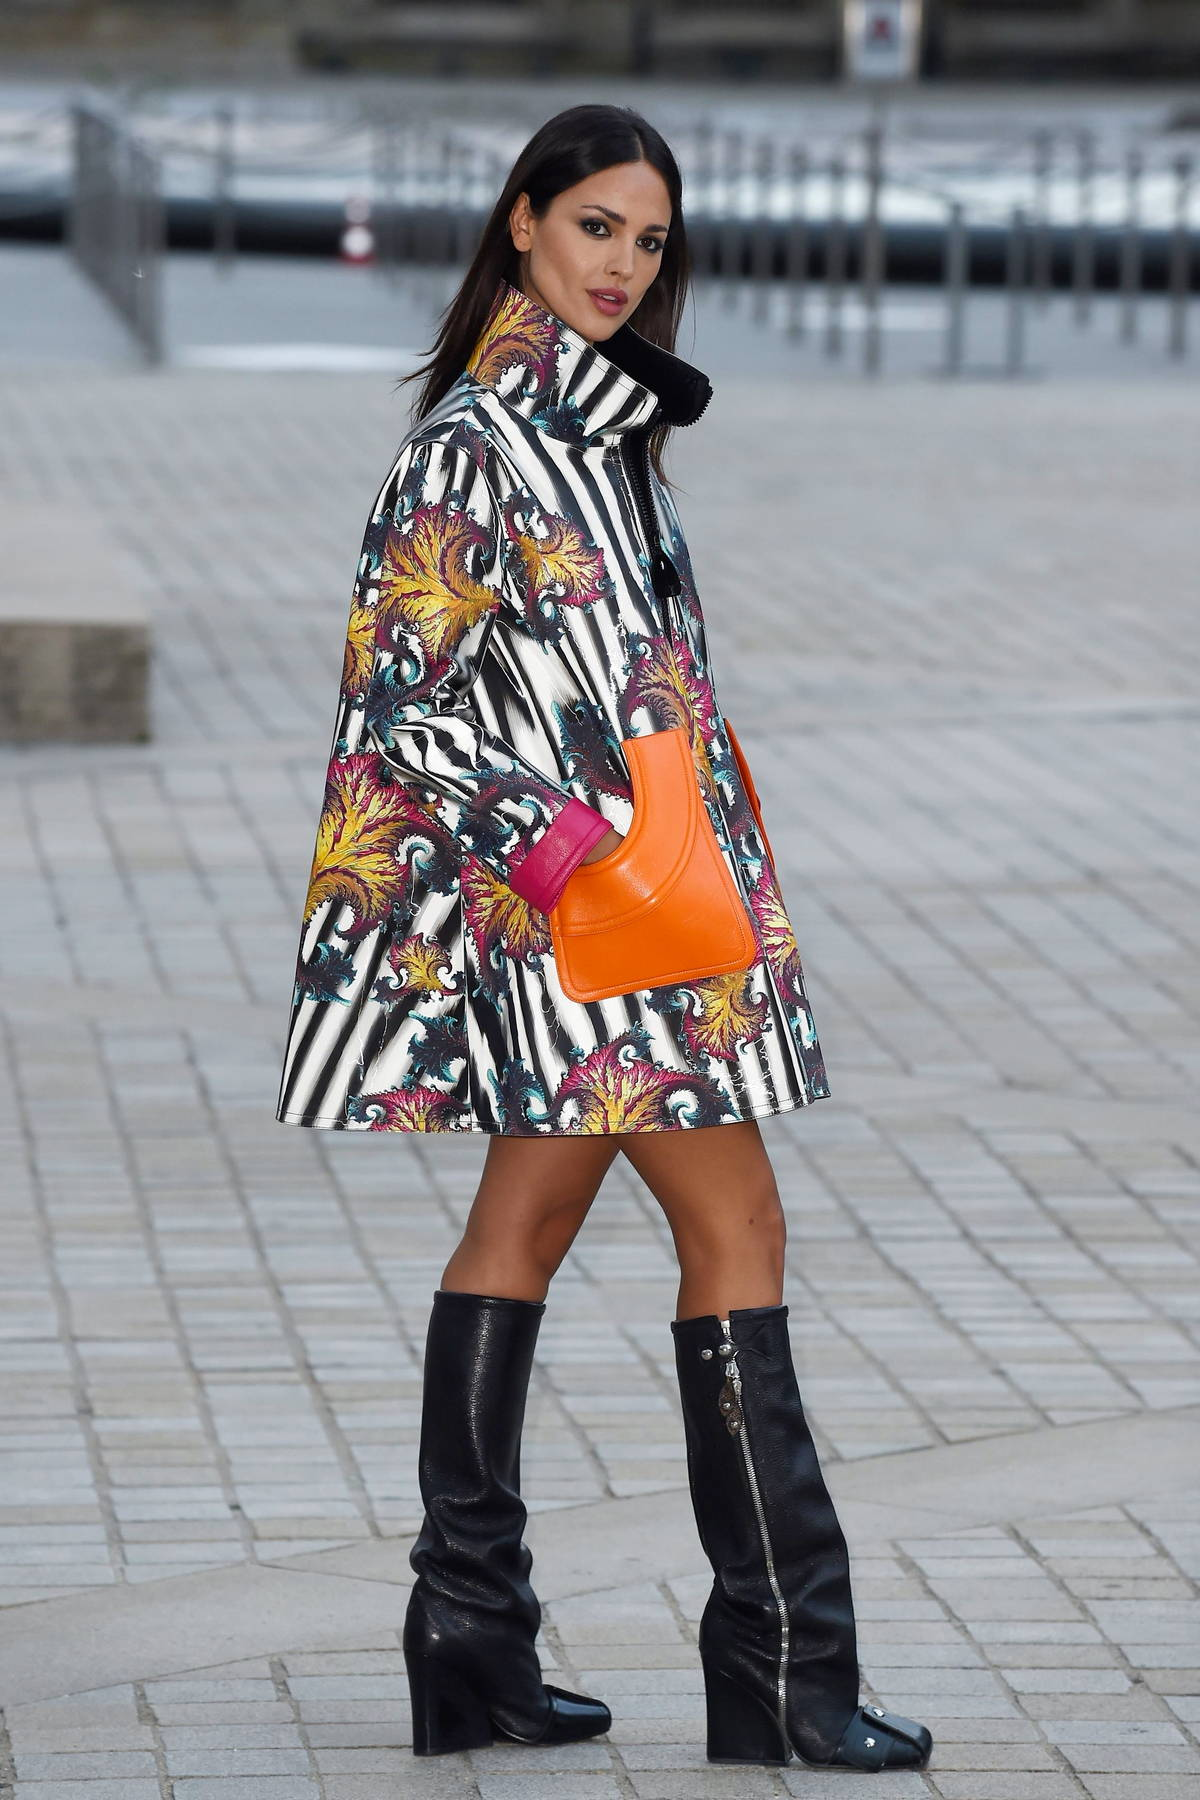 Eiza Gonzalez attends the Louis Vuitton SS22 show during Paris Fashion Week in Paris, France